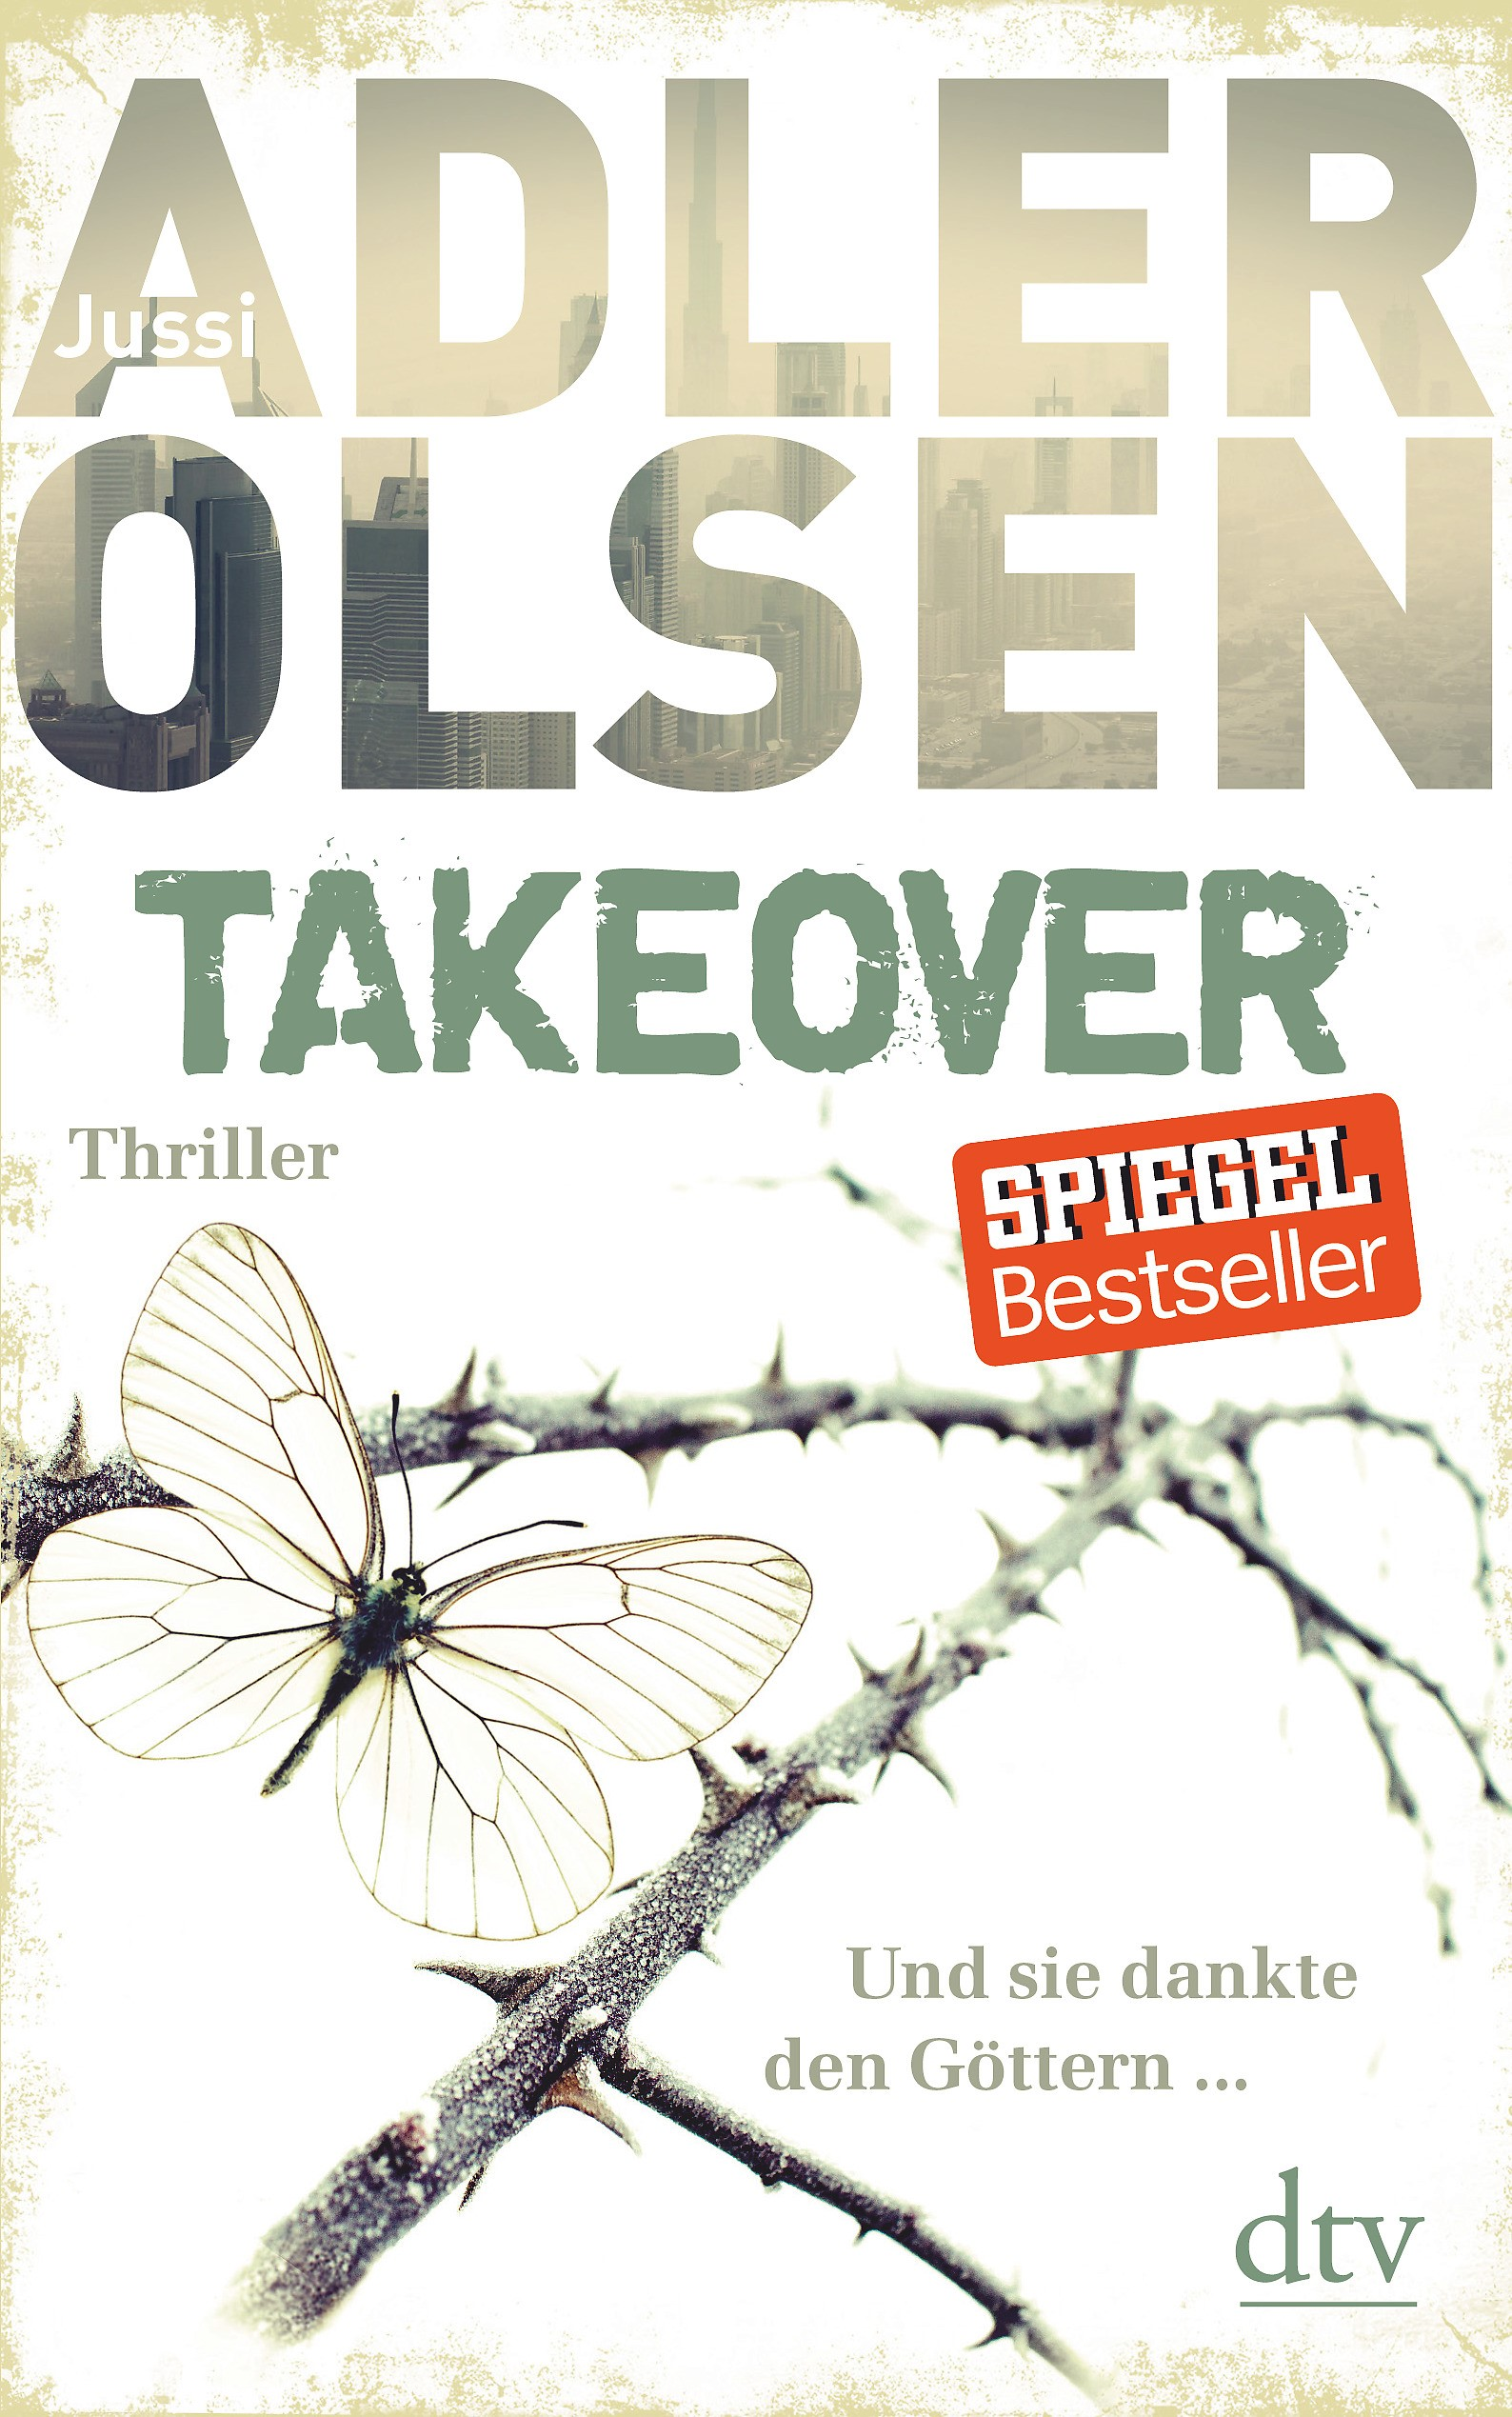 TAKEOVER. Und sie dankte den Göttern ... | Adler-Olsen, 2015 | Buch (Cover)